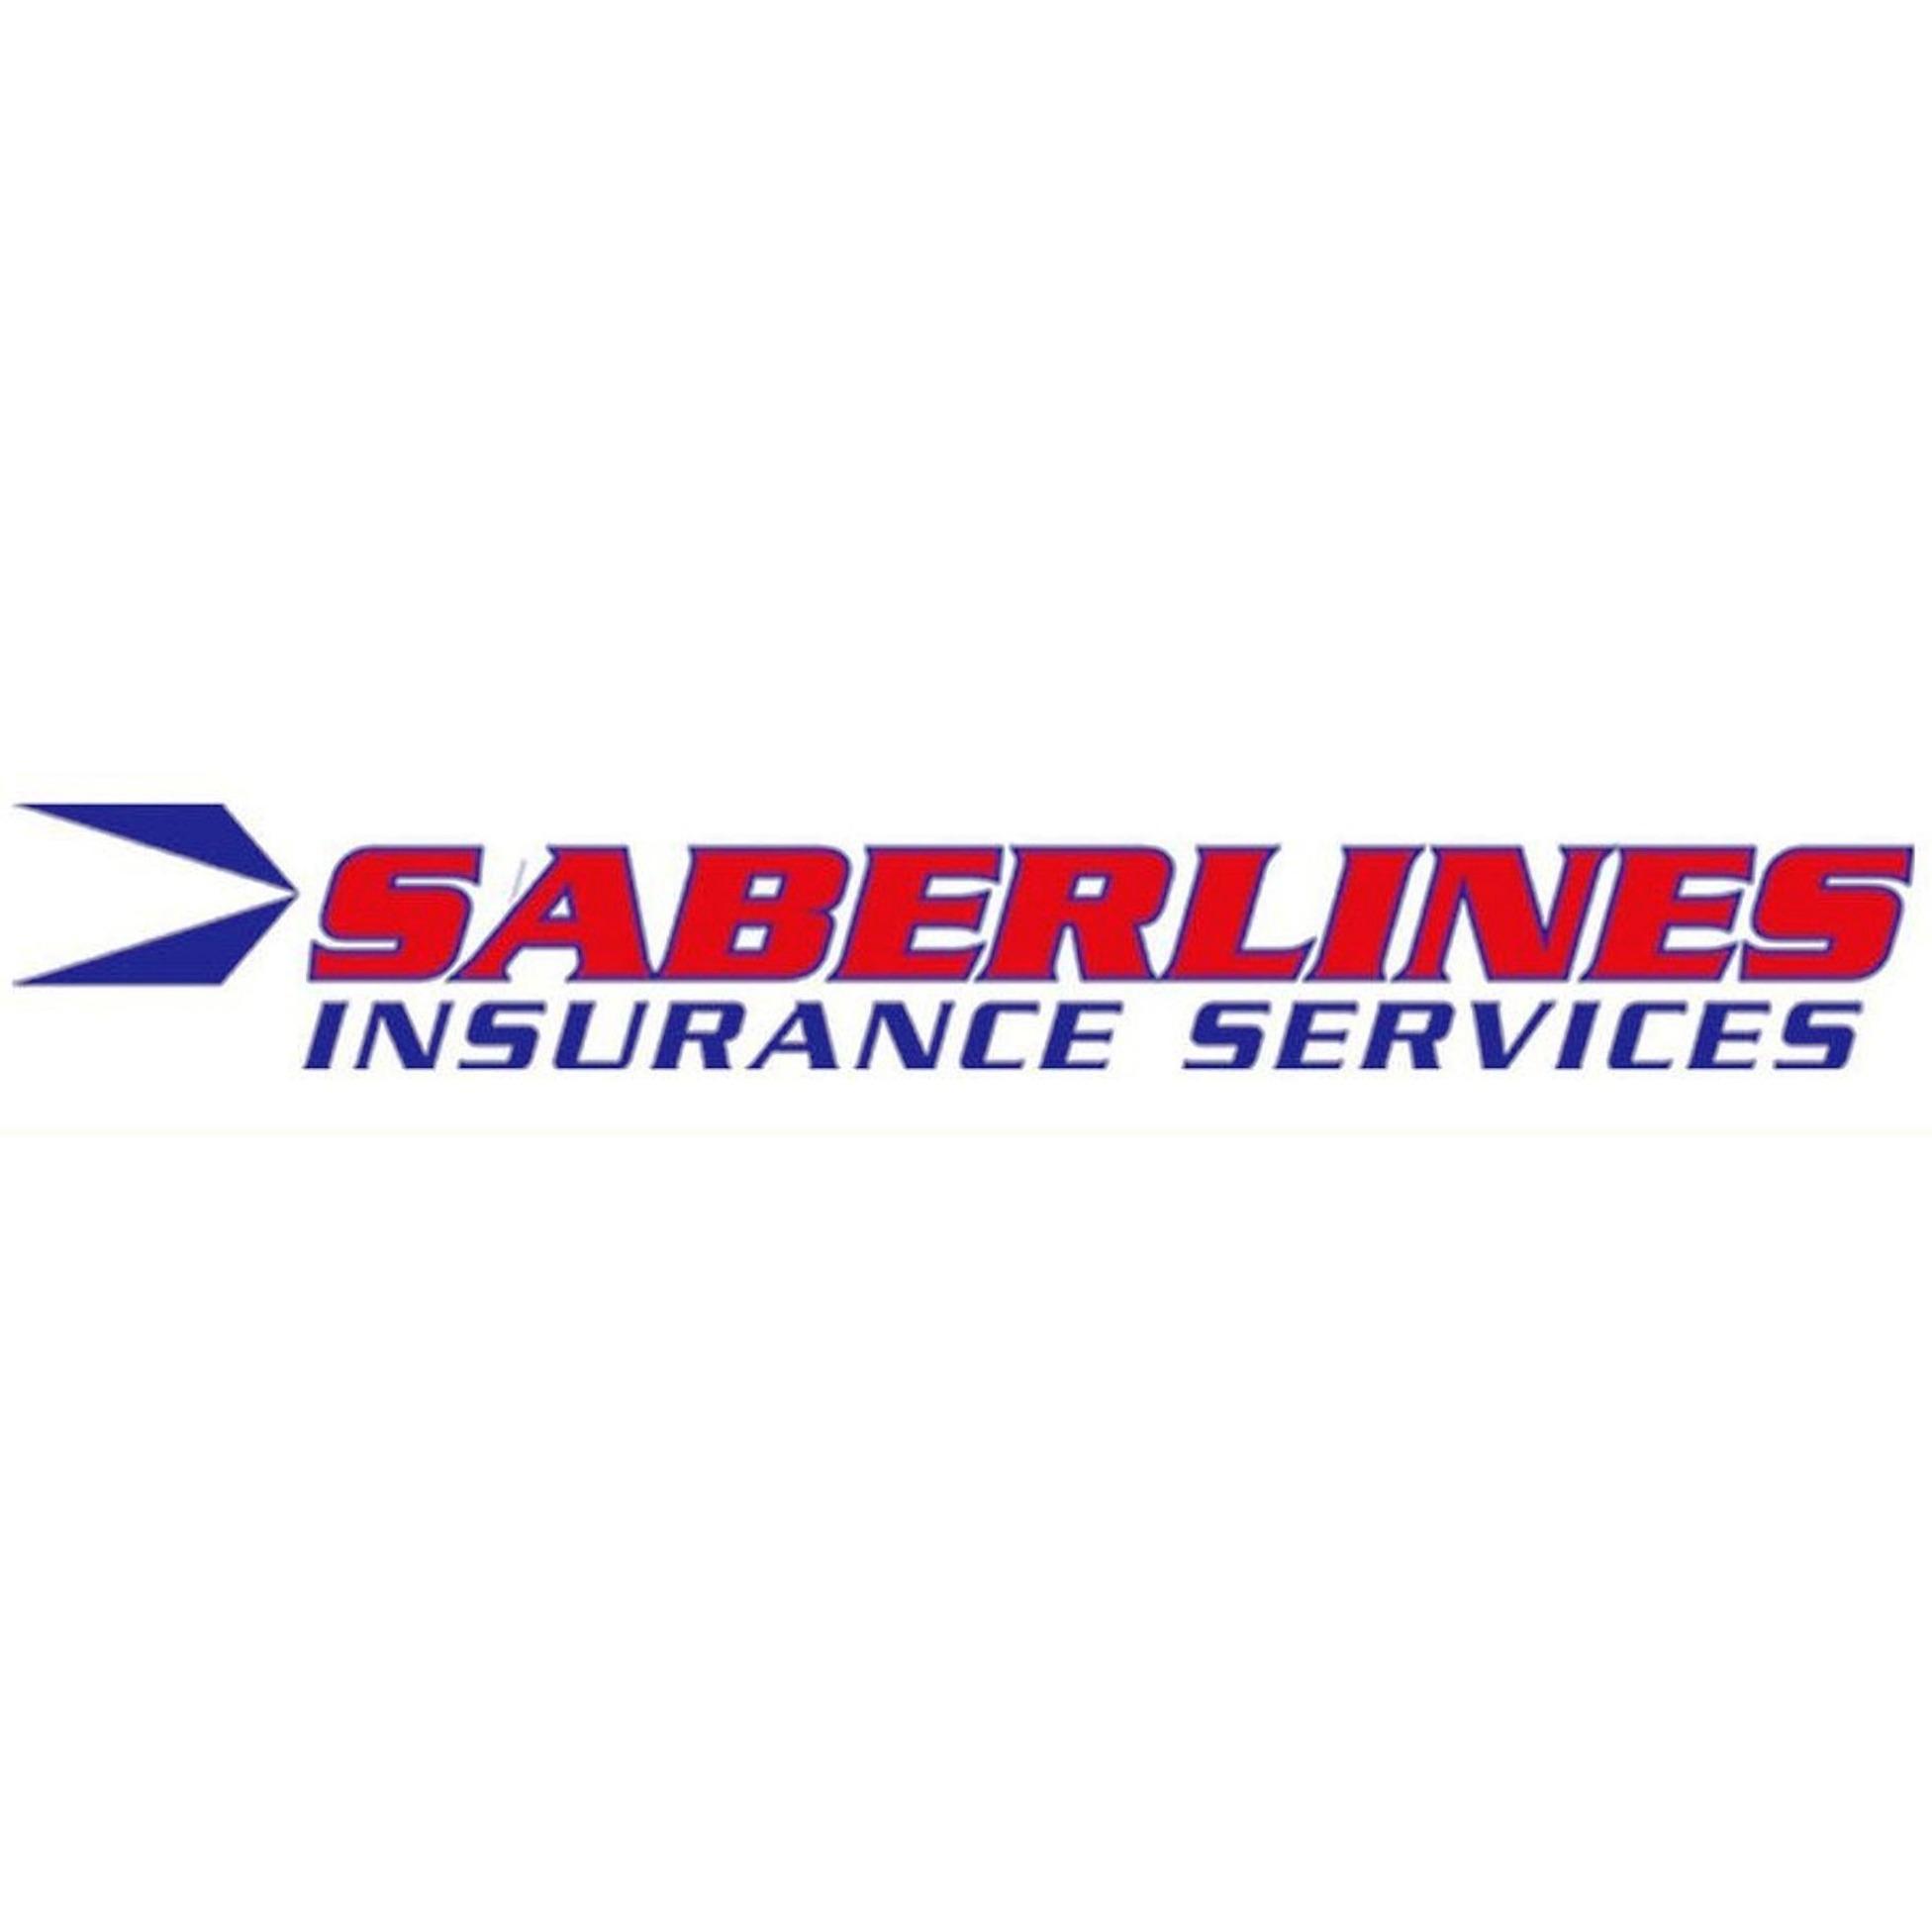 SABERLINES INSURANCE SERVICES